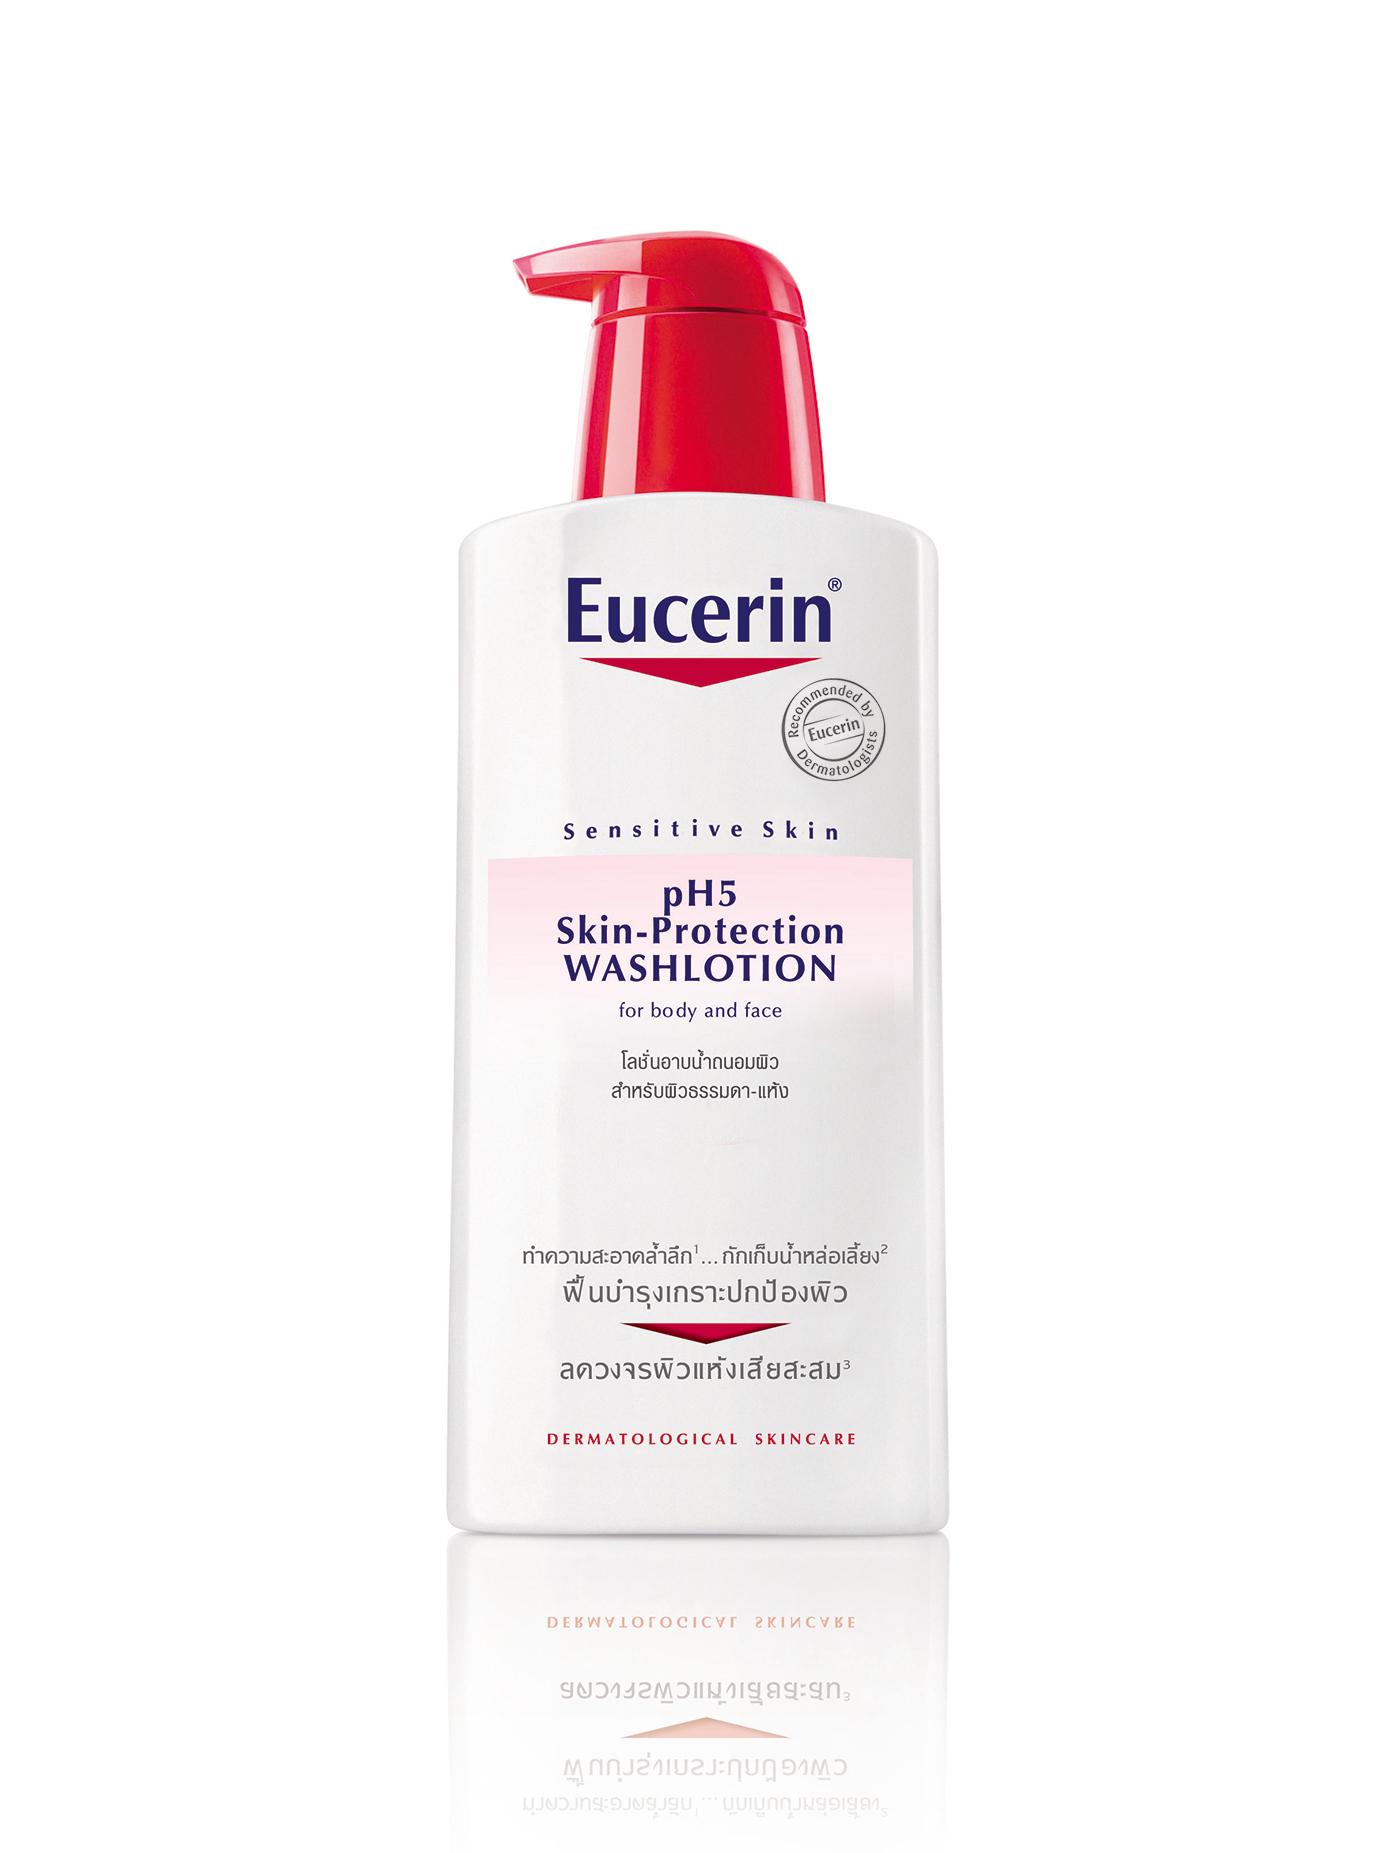 EUCERIN โลชั่นอาบน้ำ pH5 สกิน โพรเทคชั่น 400 มล.